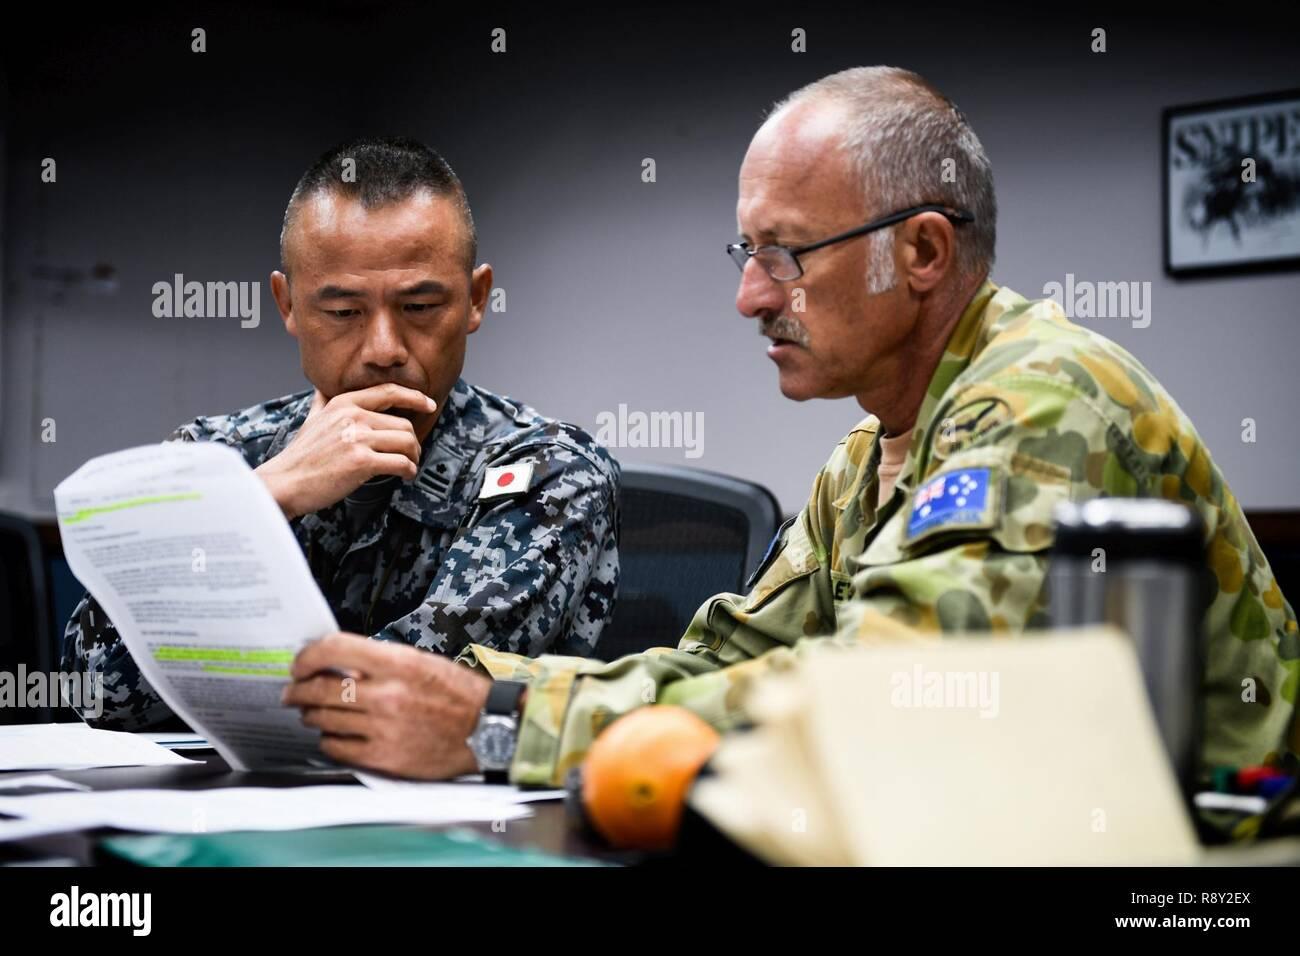 Japan Air Self-Defense Force Maj  Masatoshi Sugimoto, Air